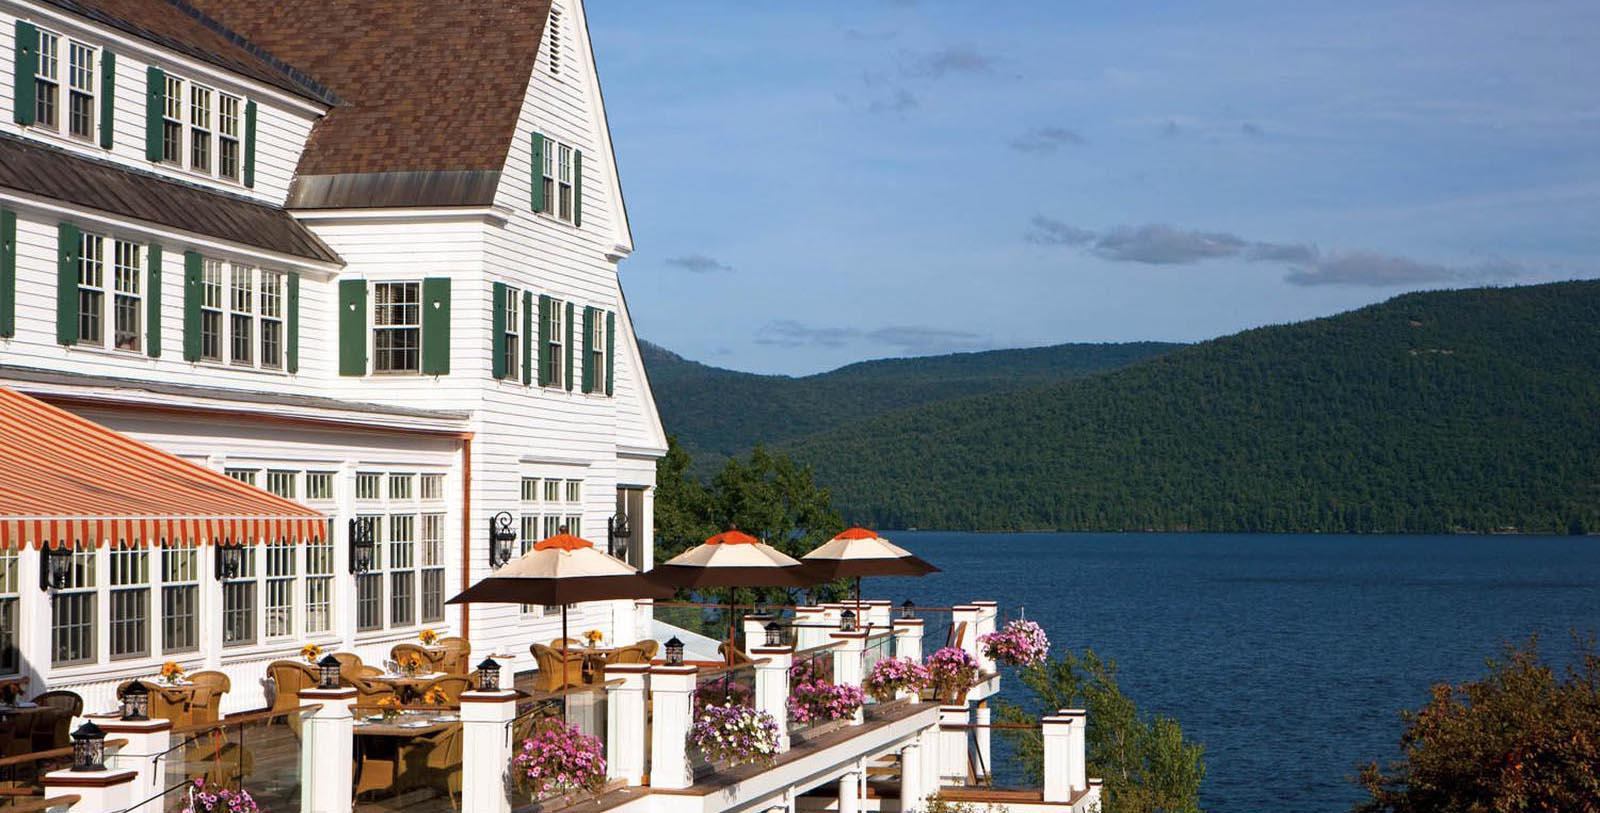 Image of The Sagamore Resort, Member of Historic Hotels of America, Explore